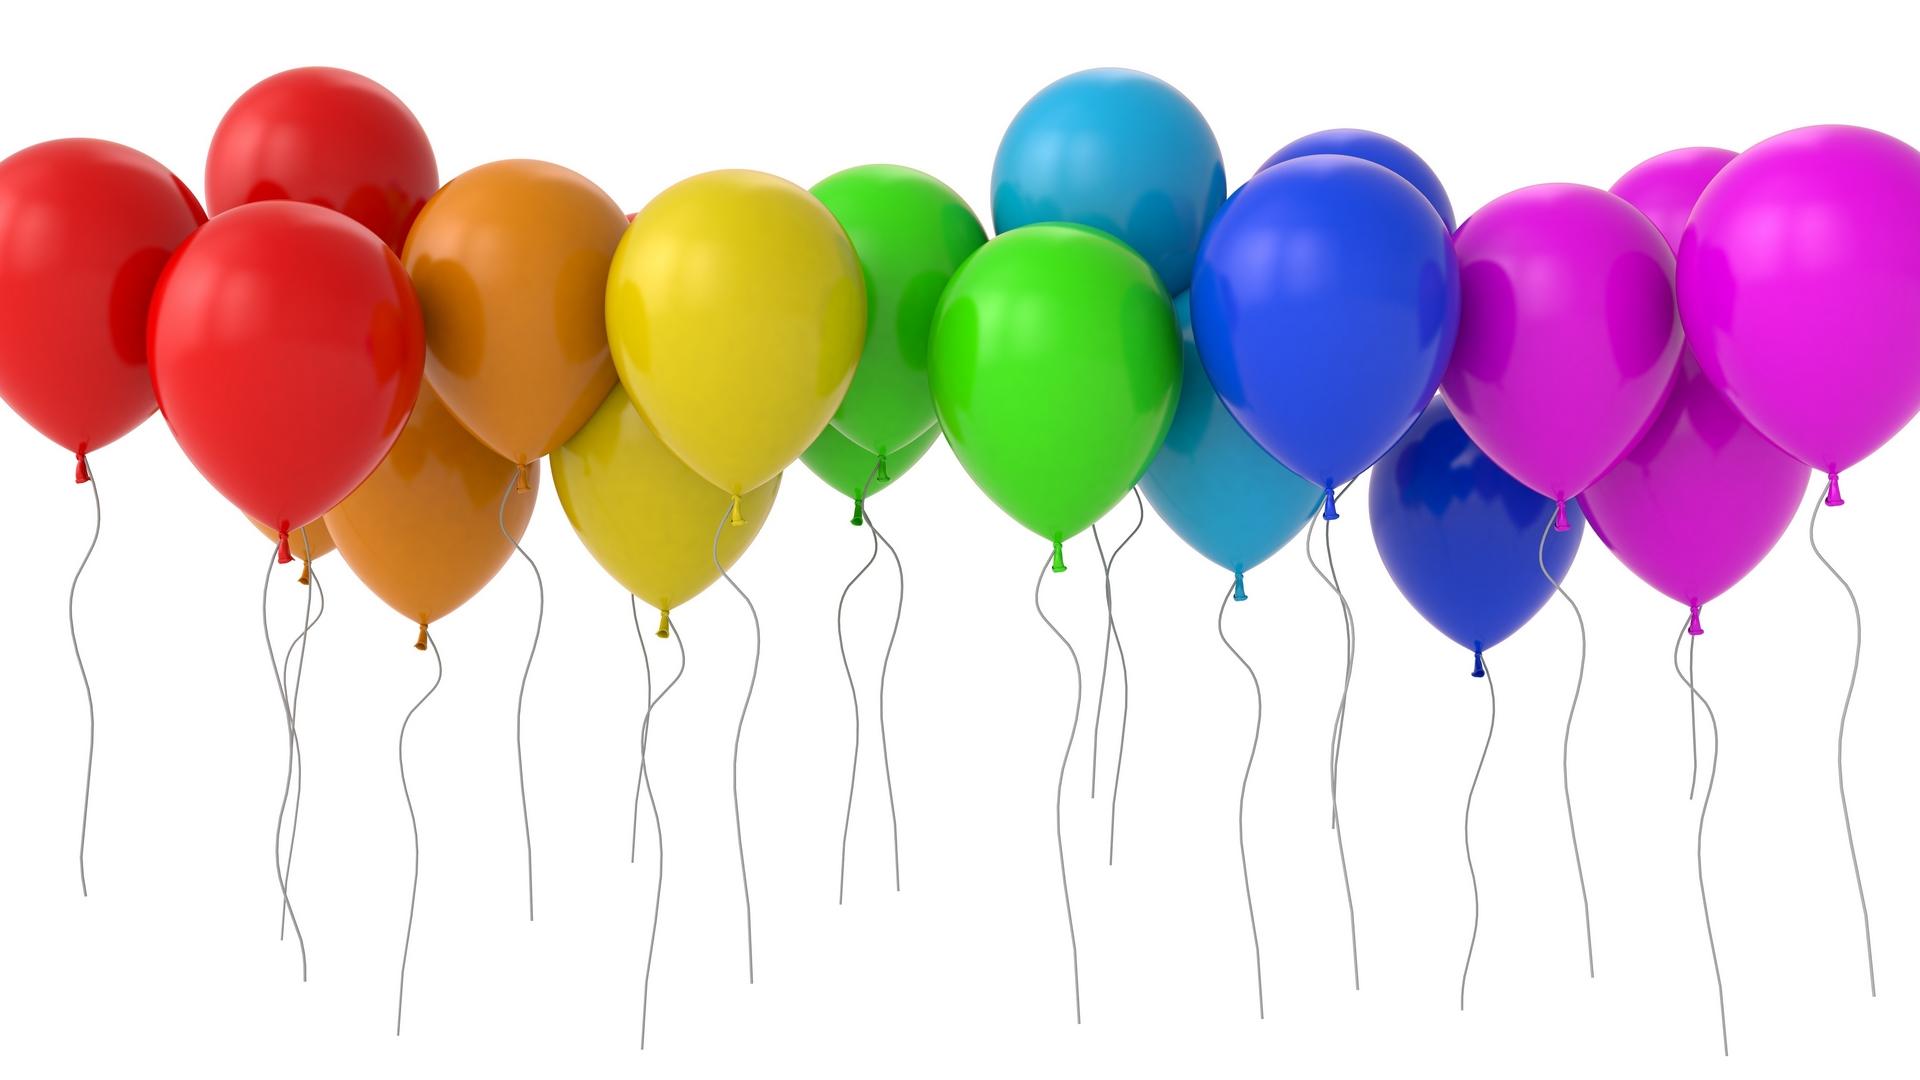 colorful hot air balloon wallpaper colored balloon 317950jpg 1920x1080